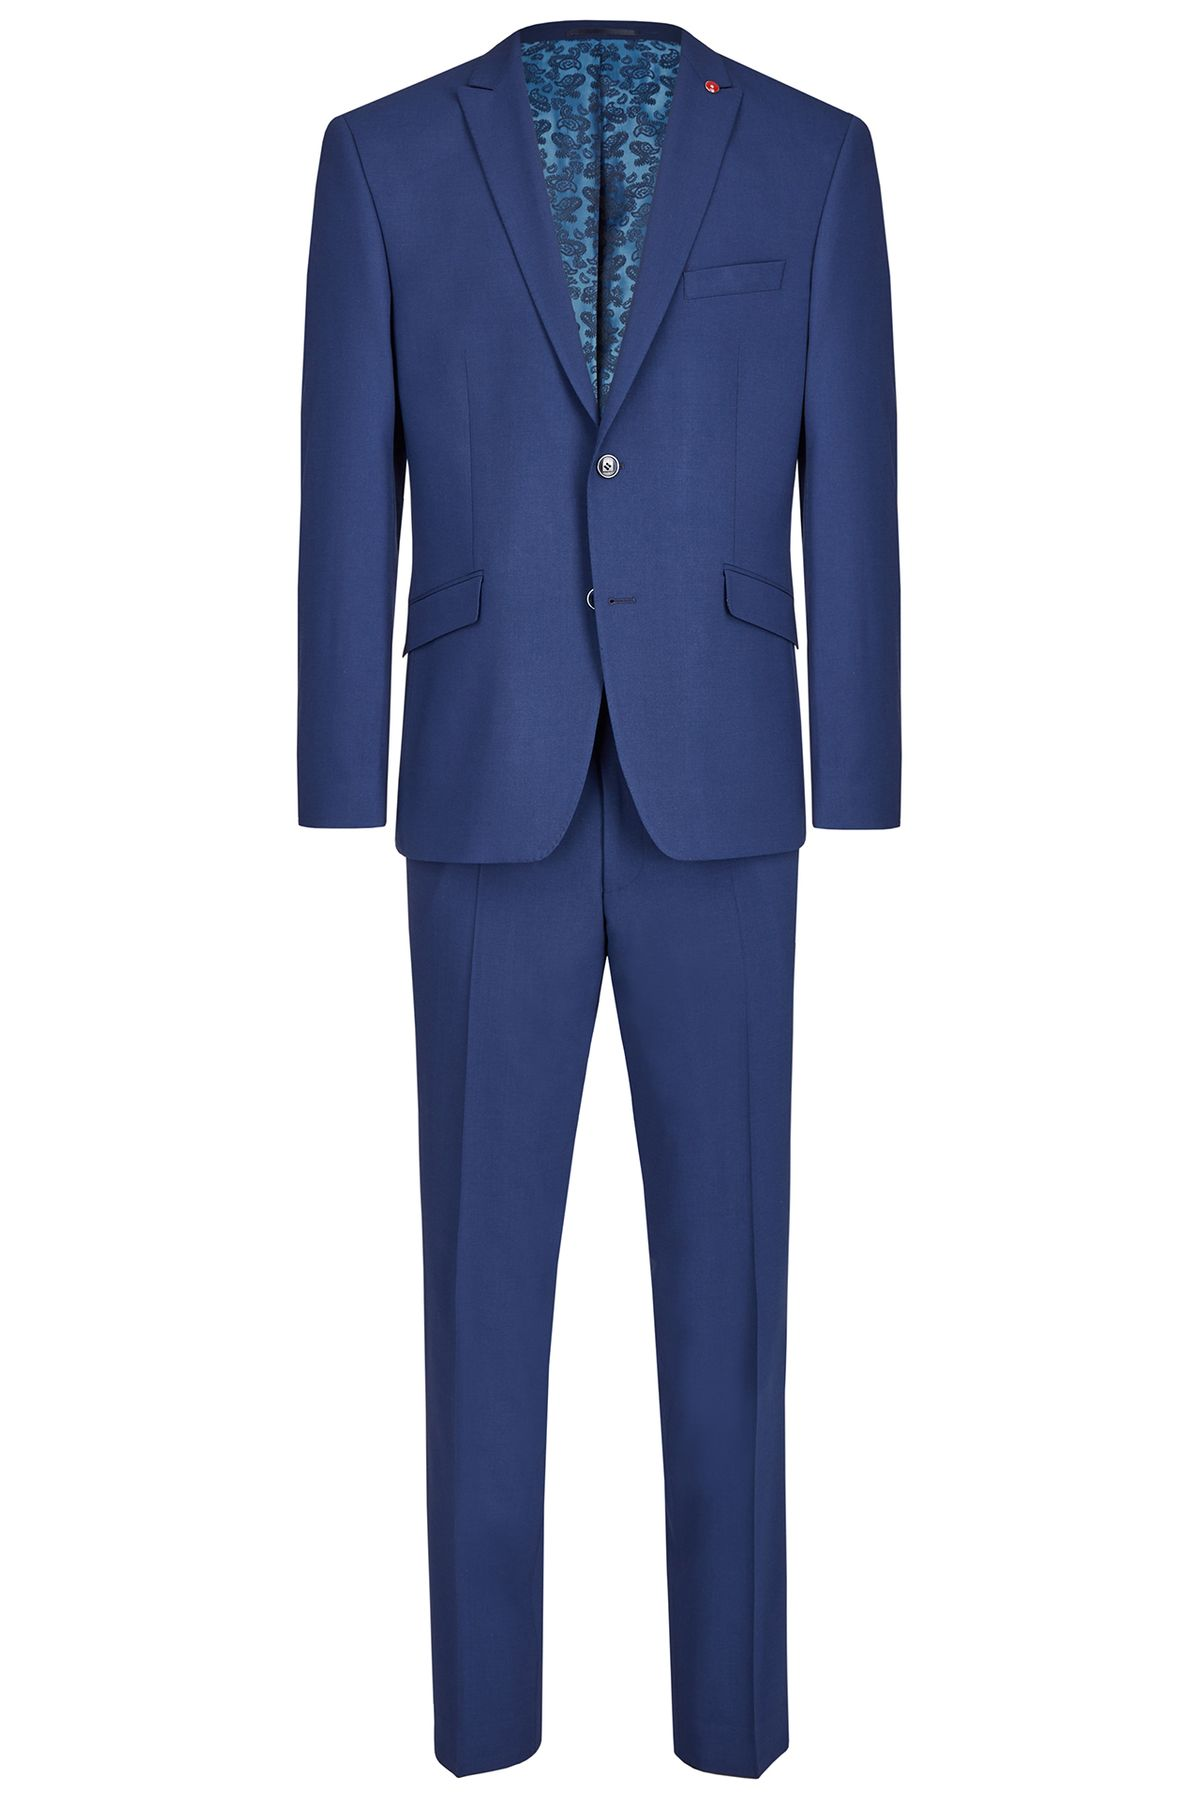 Atelier Torino GALA - Modern Fit - Herren Baukasten Anzug in Blau, Weber: Tollegno, Tizian SS/Caio (861153) – Bild 1